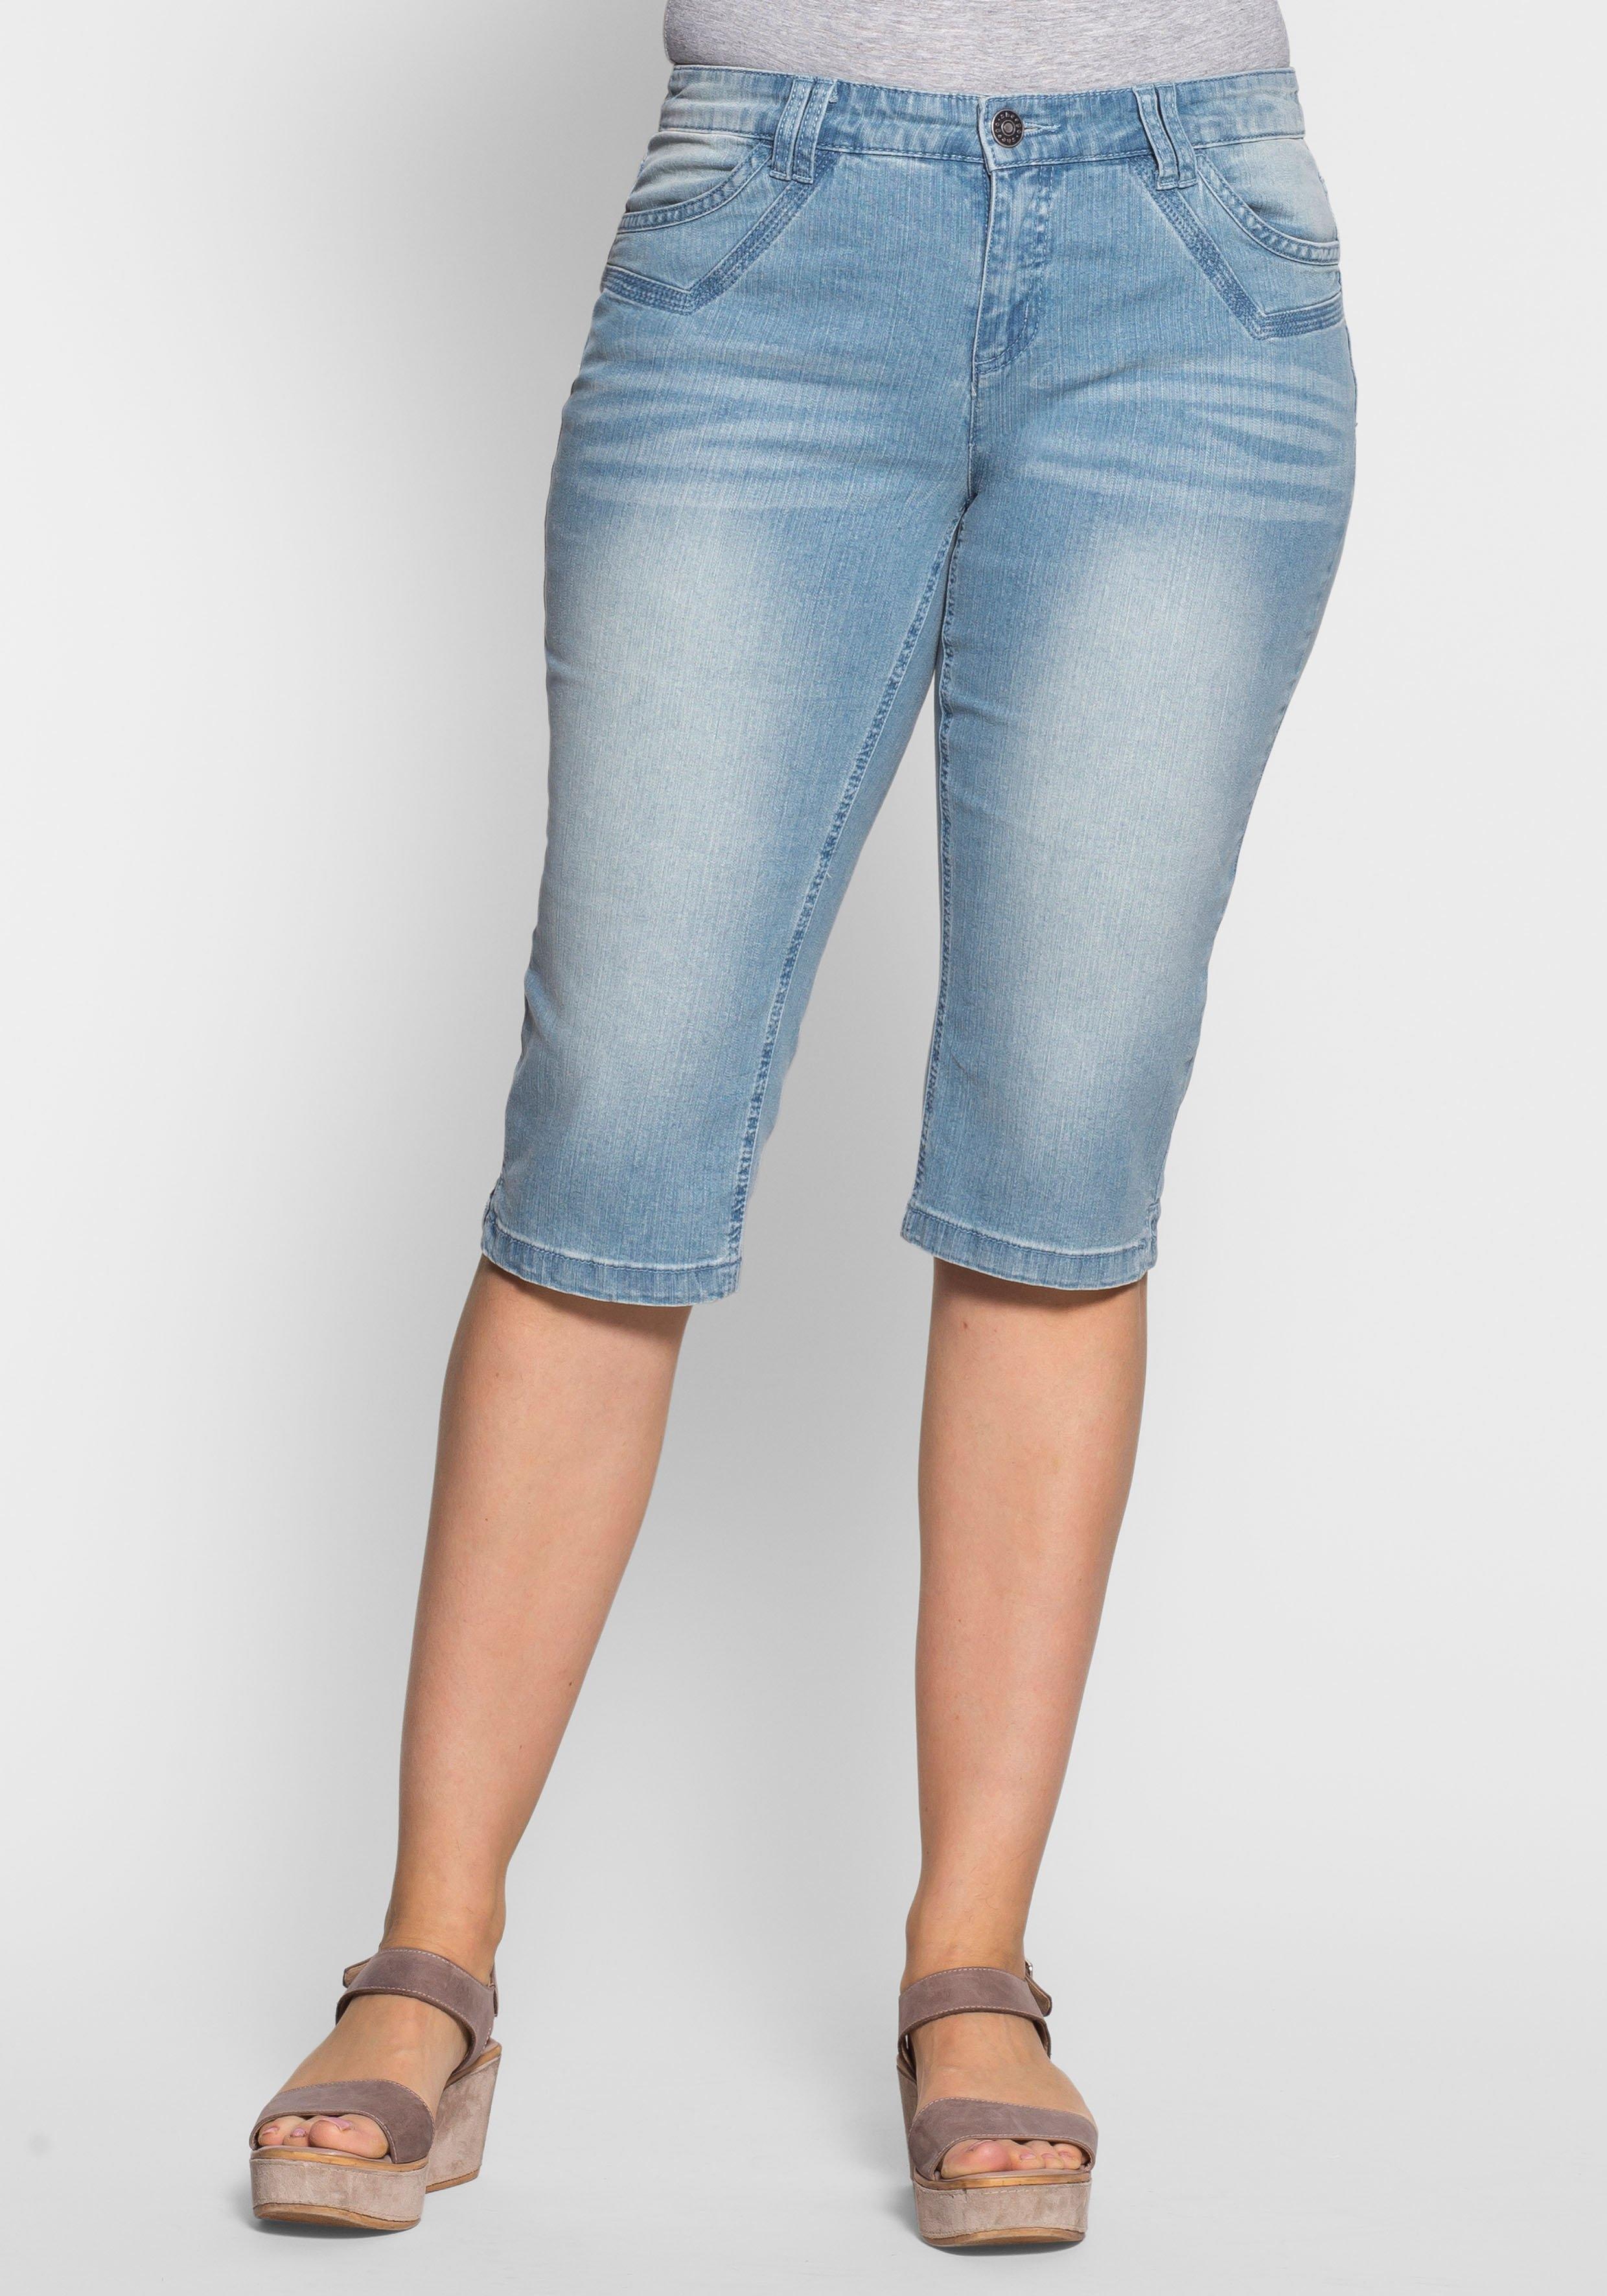 Sheego Denim sheego Denim capri-jeans nu online kopen bij OTTO